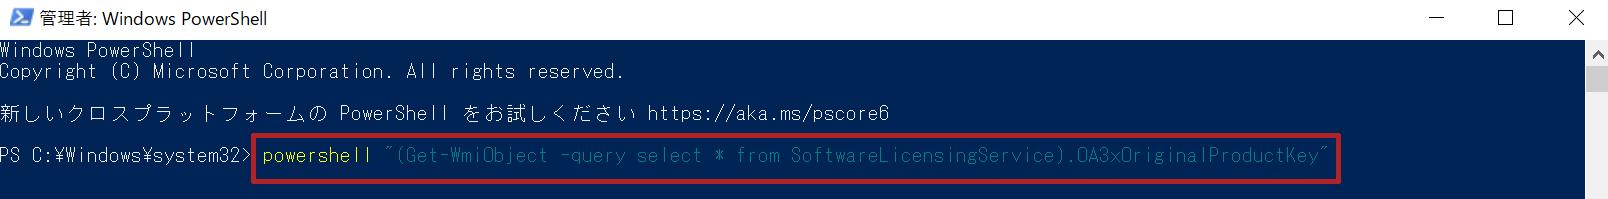 Windows PowerShellでプロダクトキーを確認する